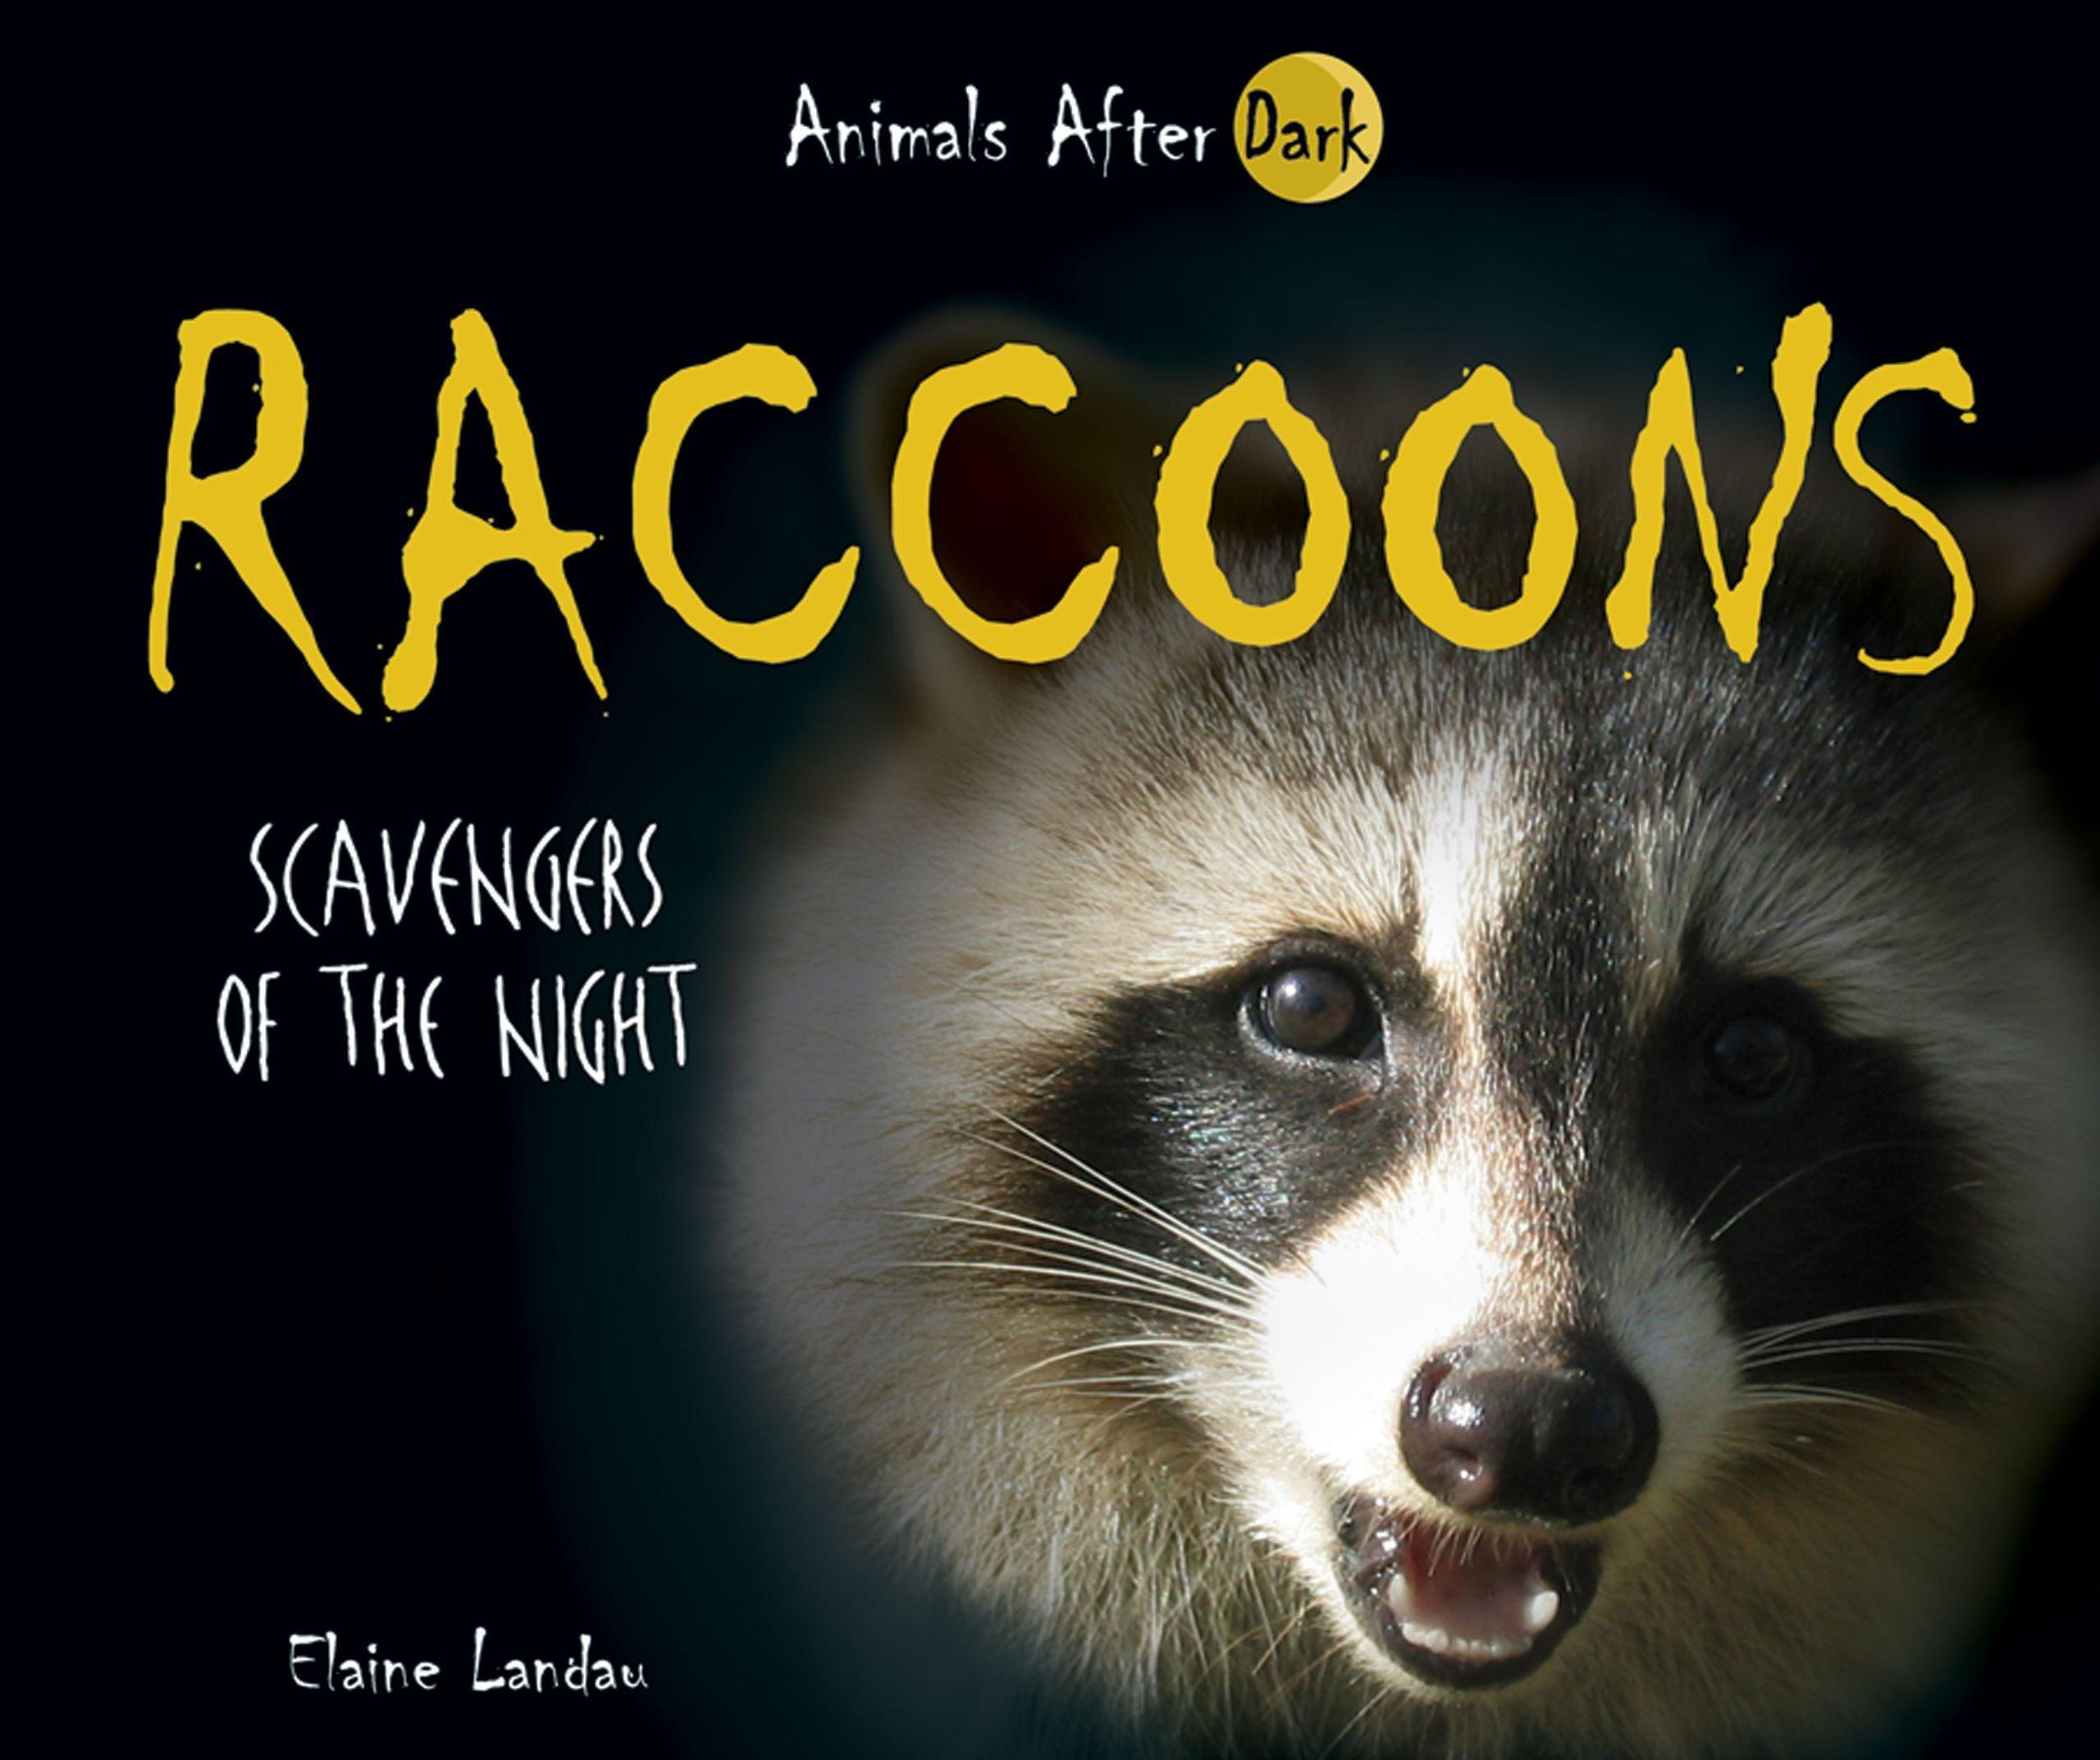 Raccoons Scavengers Of The Night Animals After Dark Elaine Landau 9780766027671 Amazon Books